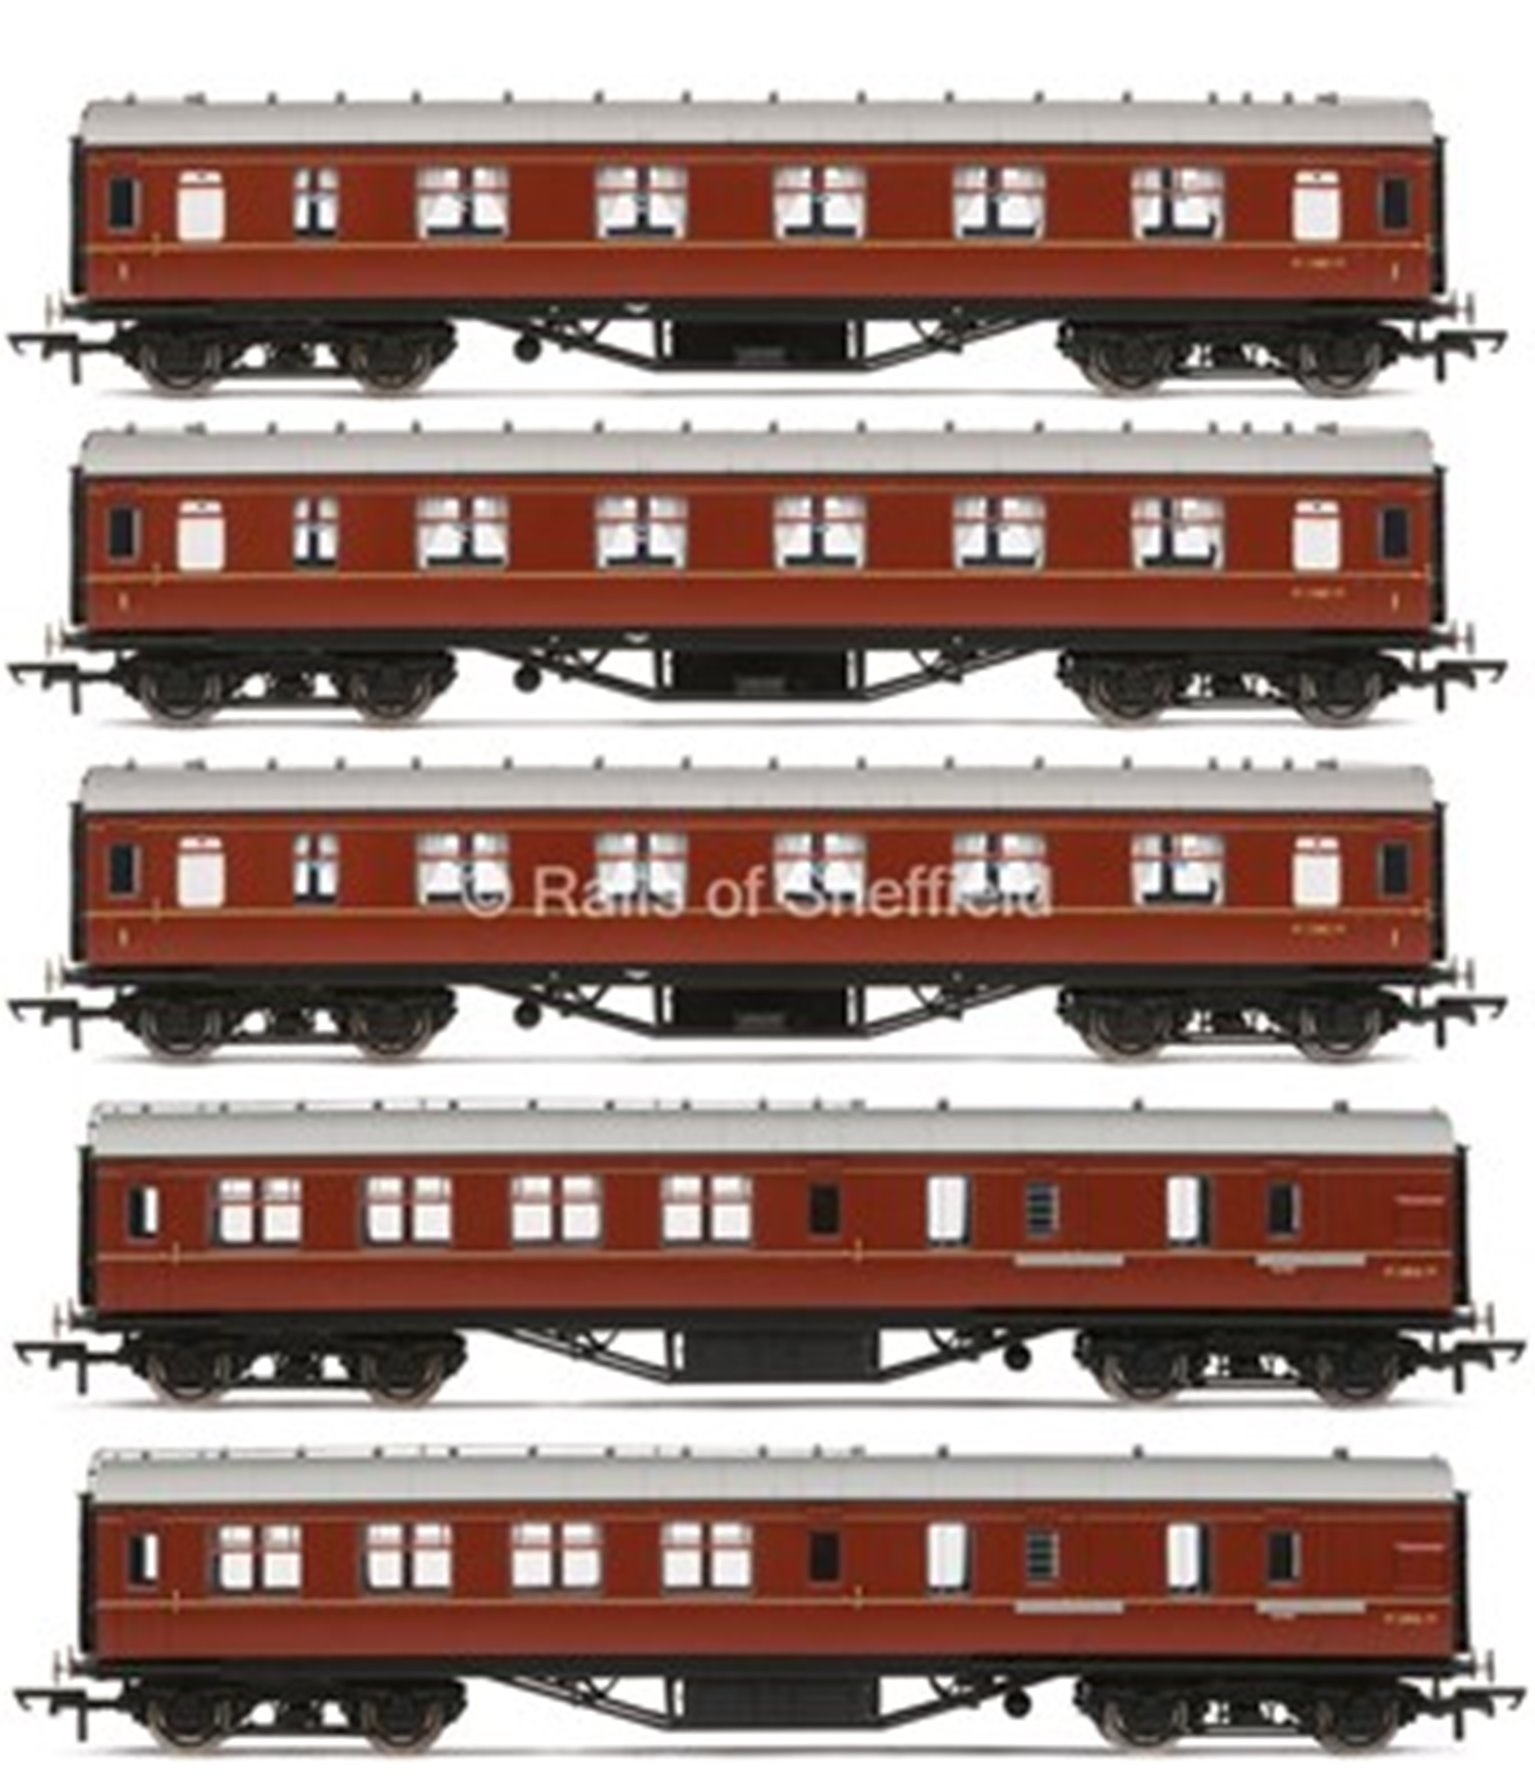 Set of 5 Stanier Period III BR (exLMS) Maroon Passenger Coaches